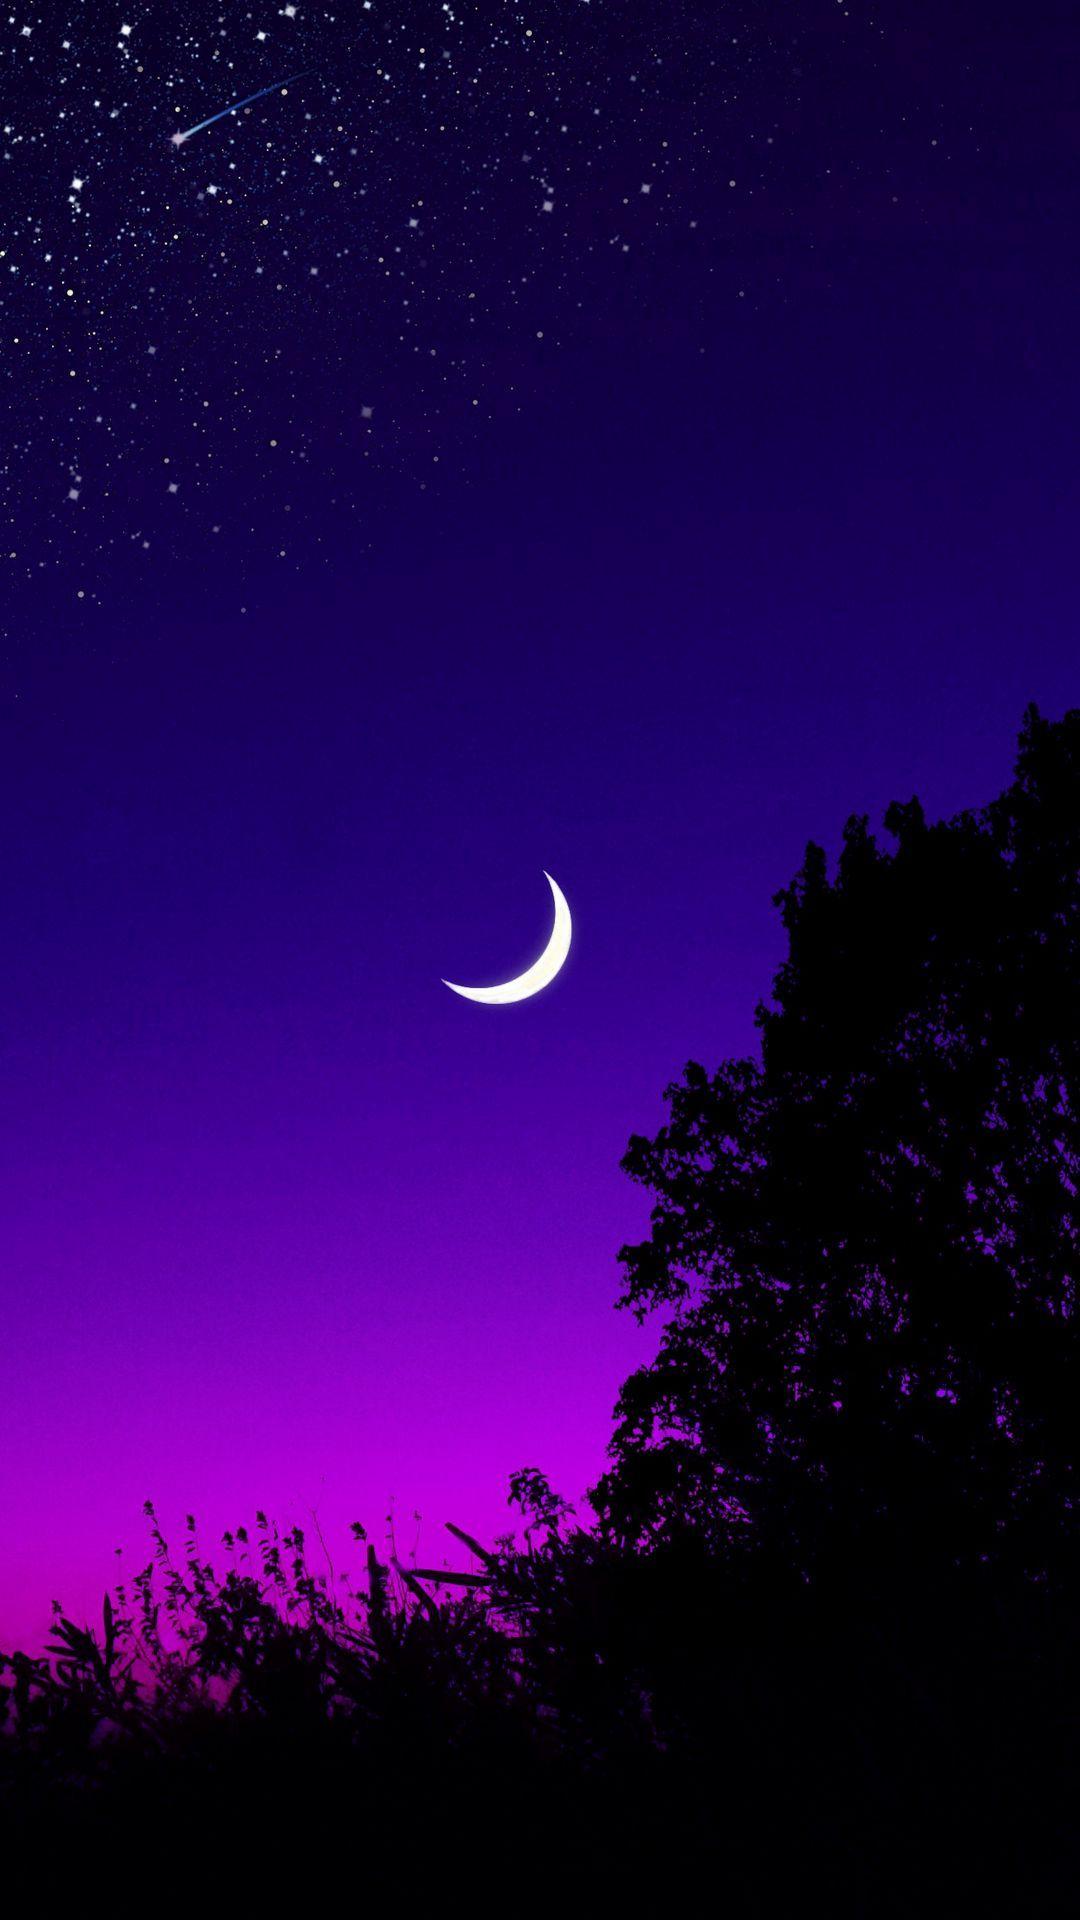 Download wallpaper 1080x1920 moon, tree, starry sky, night, stars, dark samsung galaxy s4, s5, note, sony xperia z, z1, z2, z3, htc one, lenovo vibe hd background